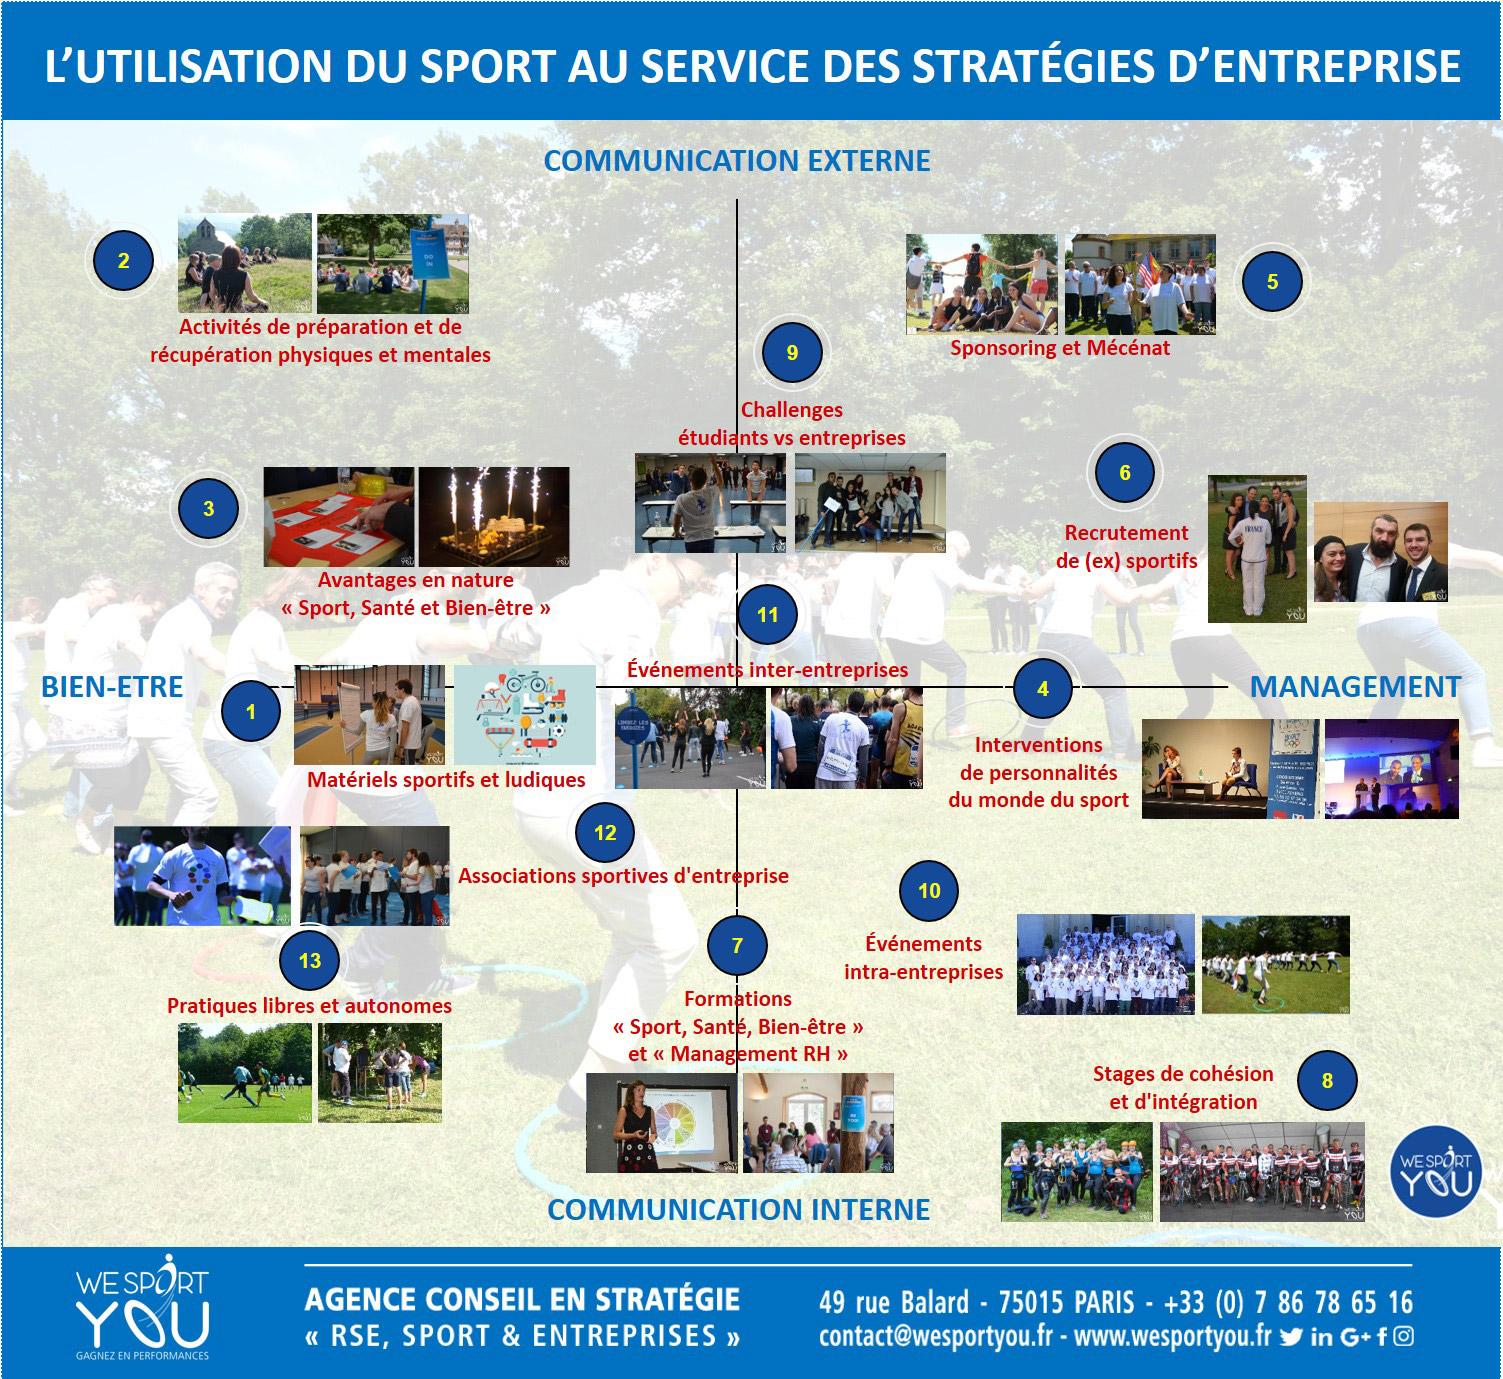 Stratégie entreprise sport & innovation